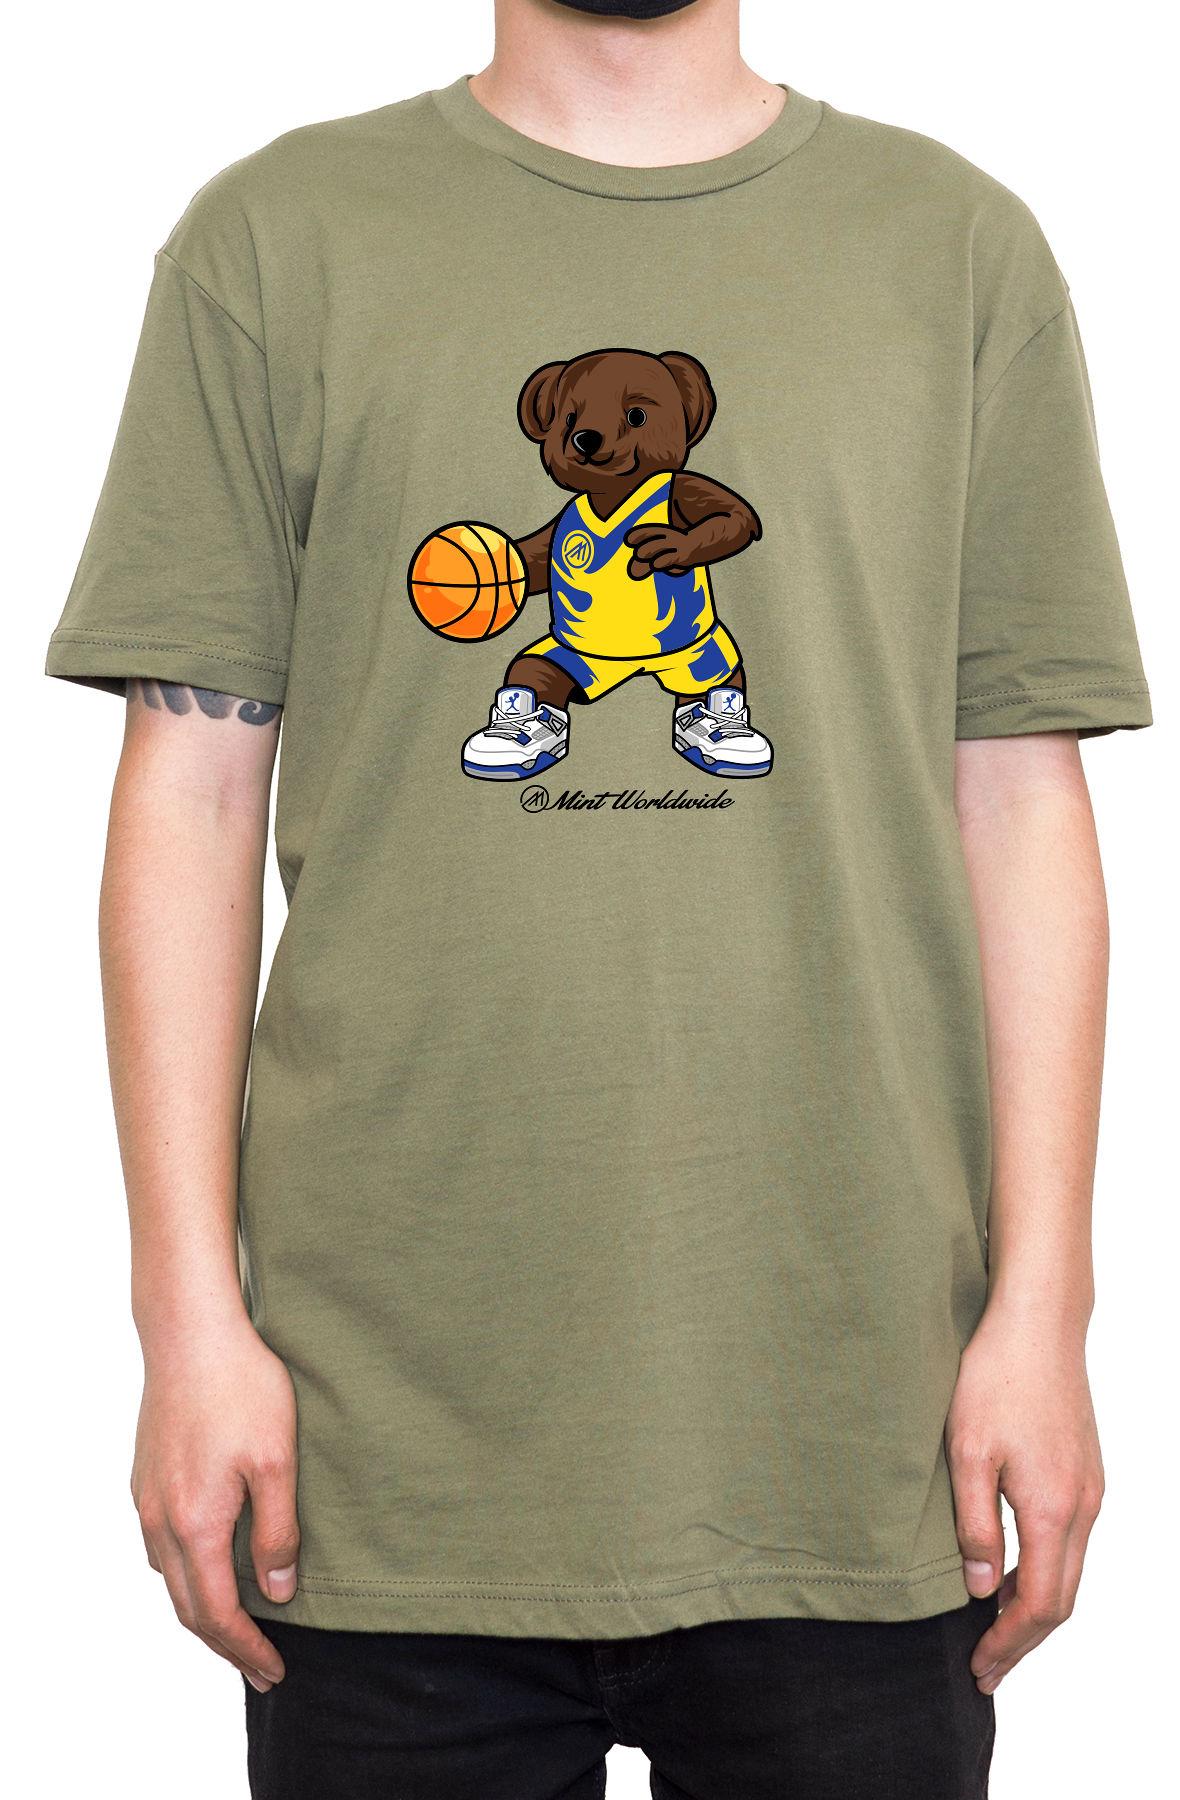 """BasketBall Bear T-shirt """" Army Green"""